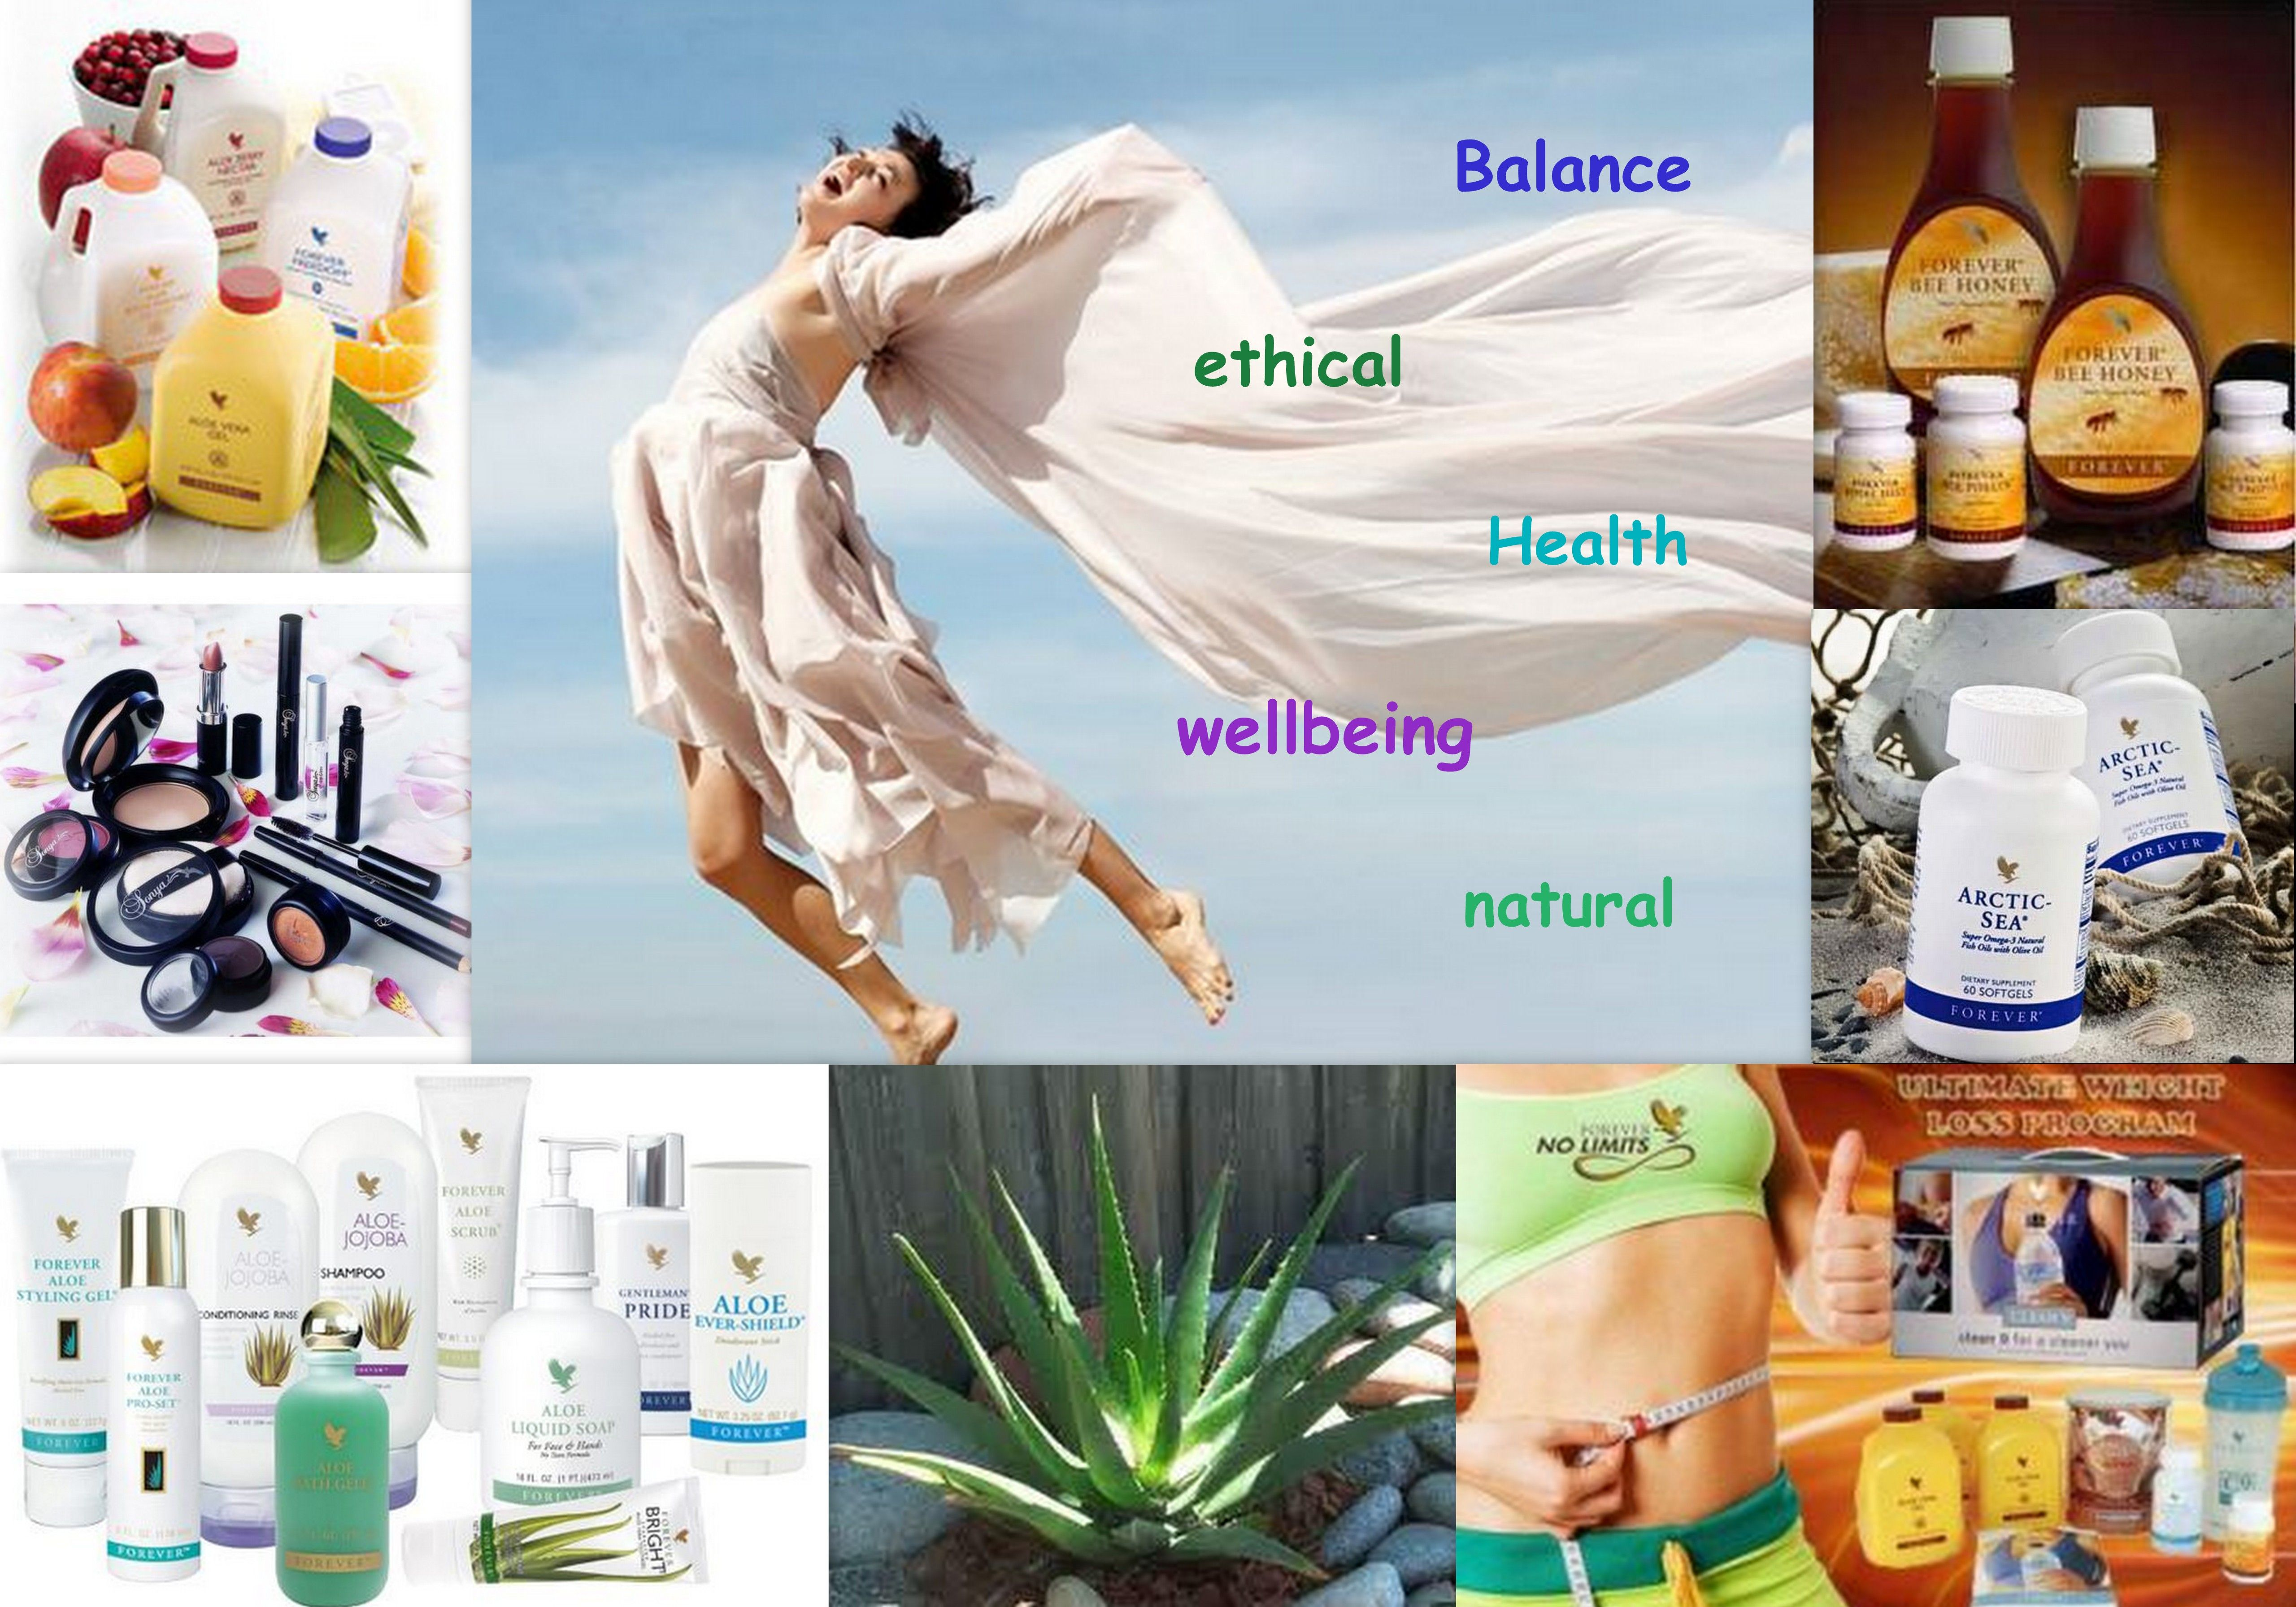 Forever Living Products Avocado Face & Body Soap (2 Pack) - rezolvaripbinfo.ro